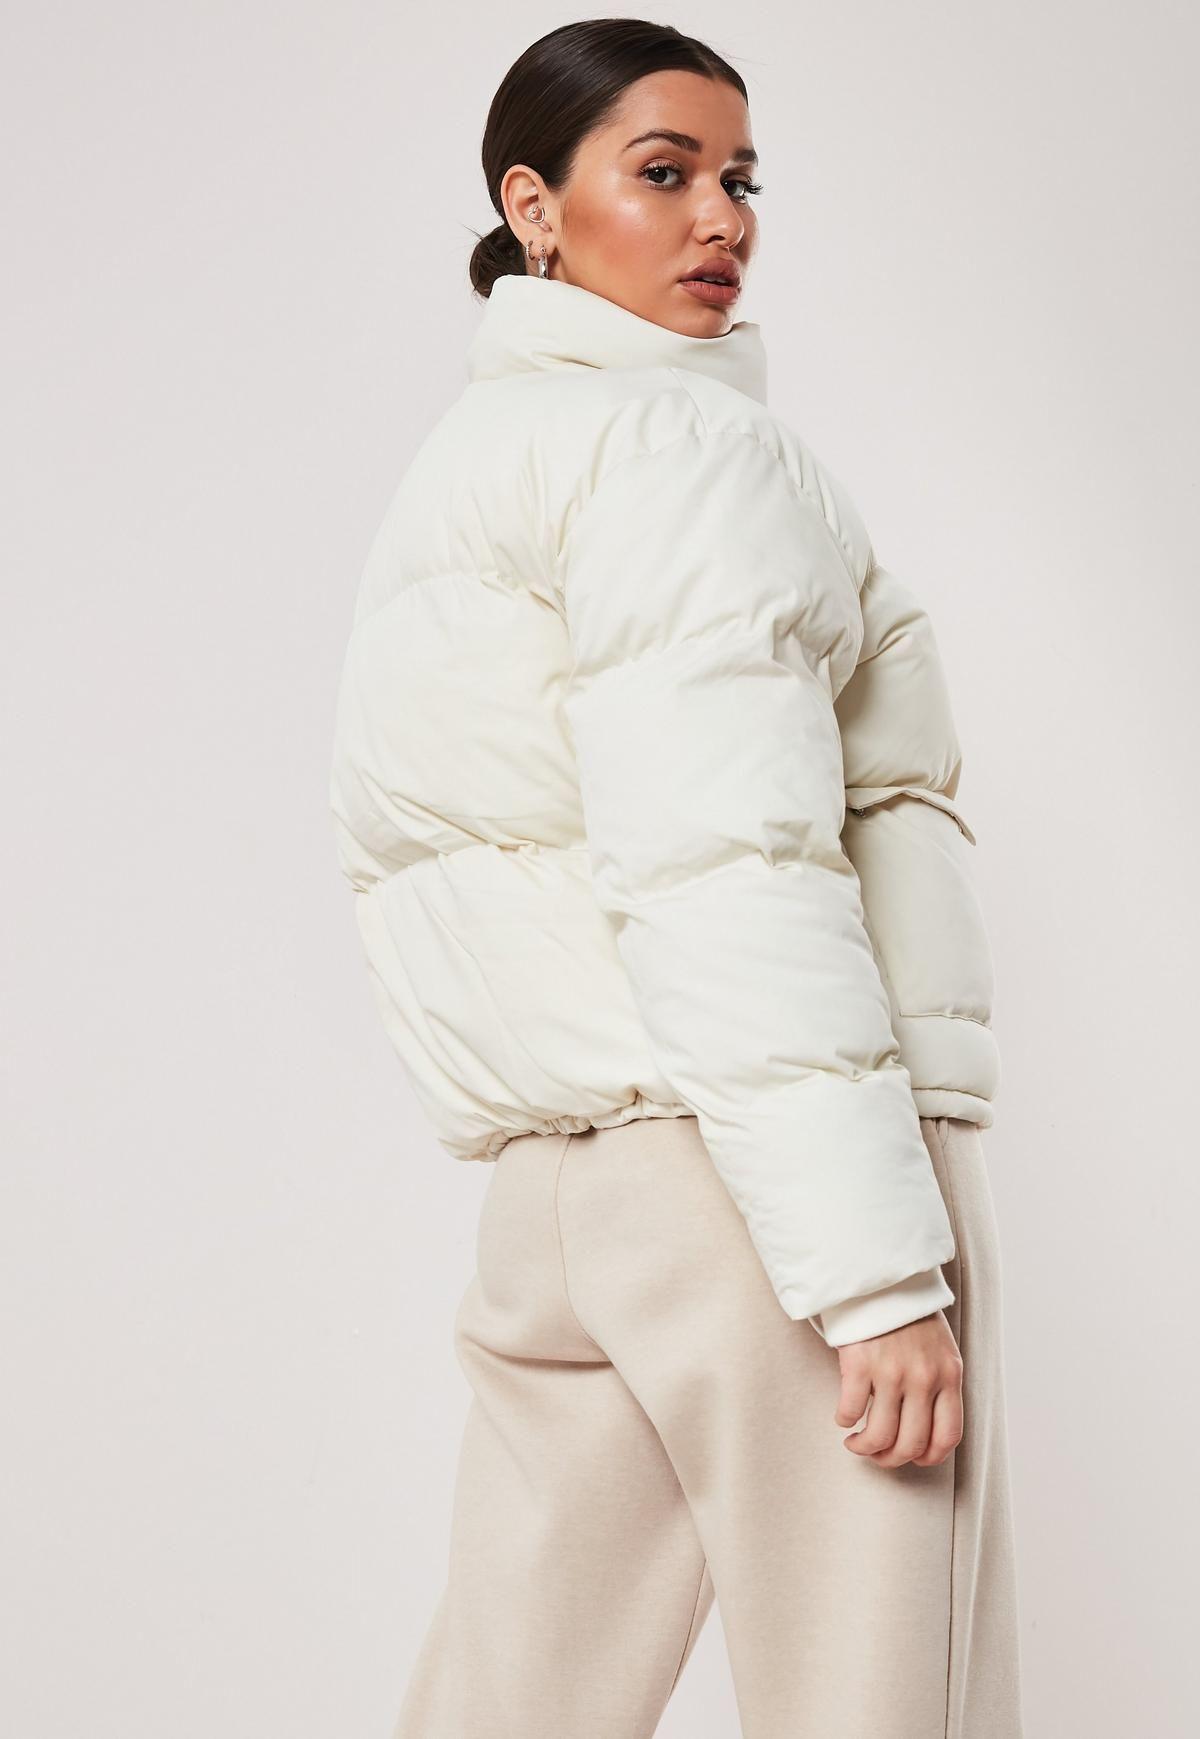 Cream Ultimate Puffer Jacket Puffer Jacket Outfit White Puffer Jacket White Puffer [ 1739 x 1200 Pixel ]